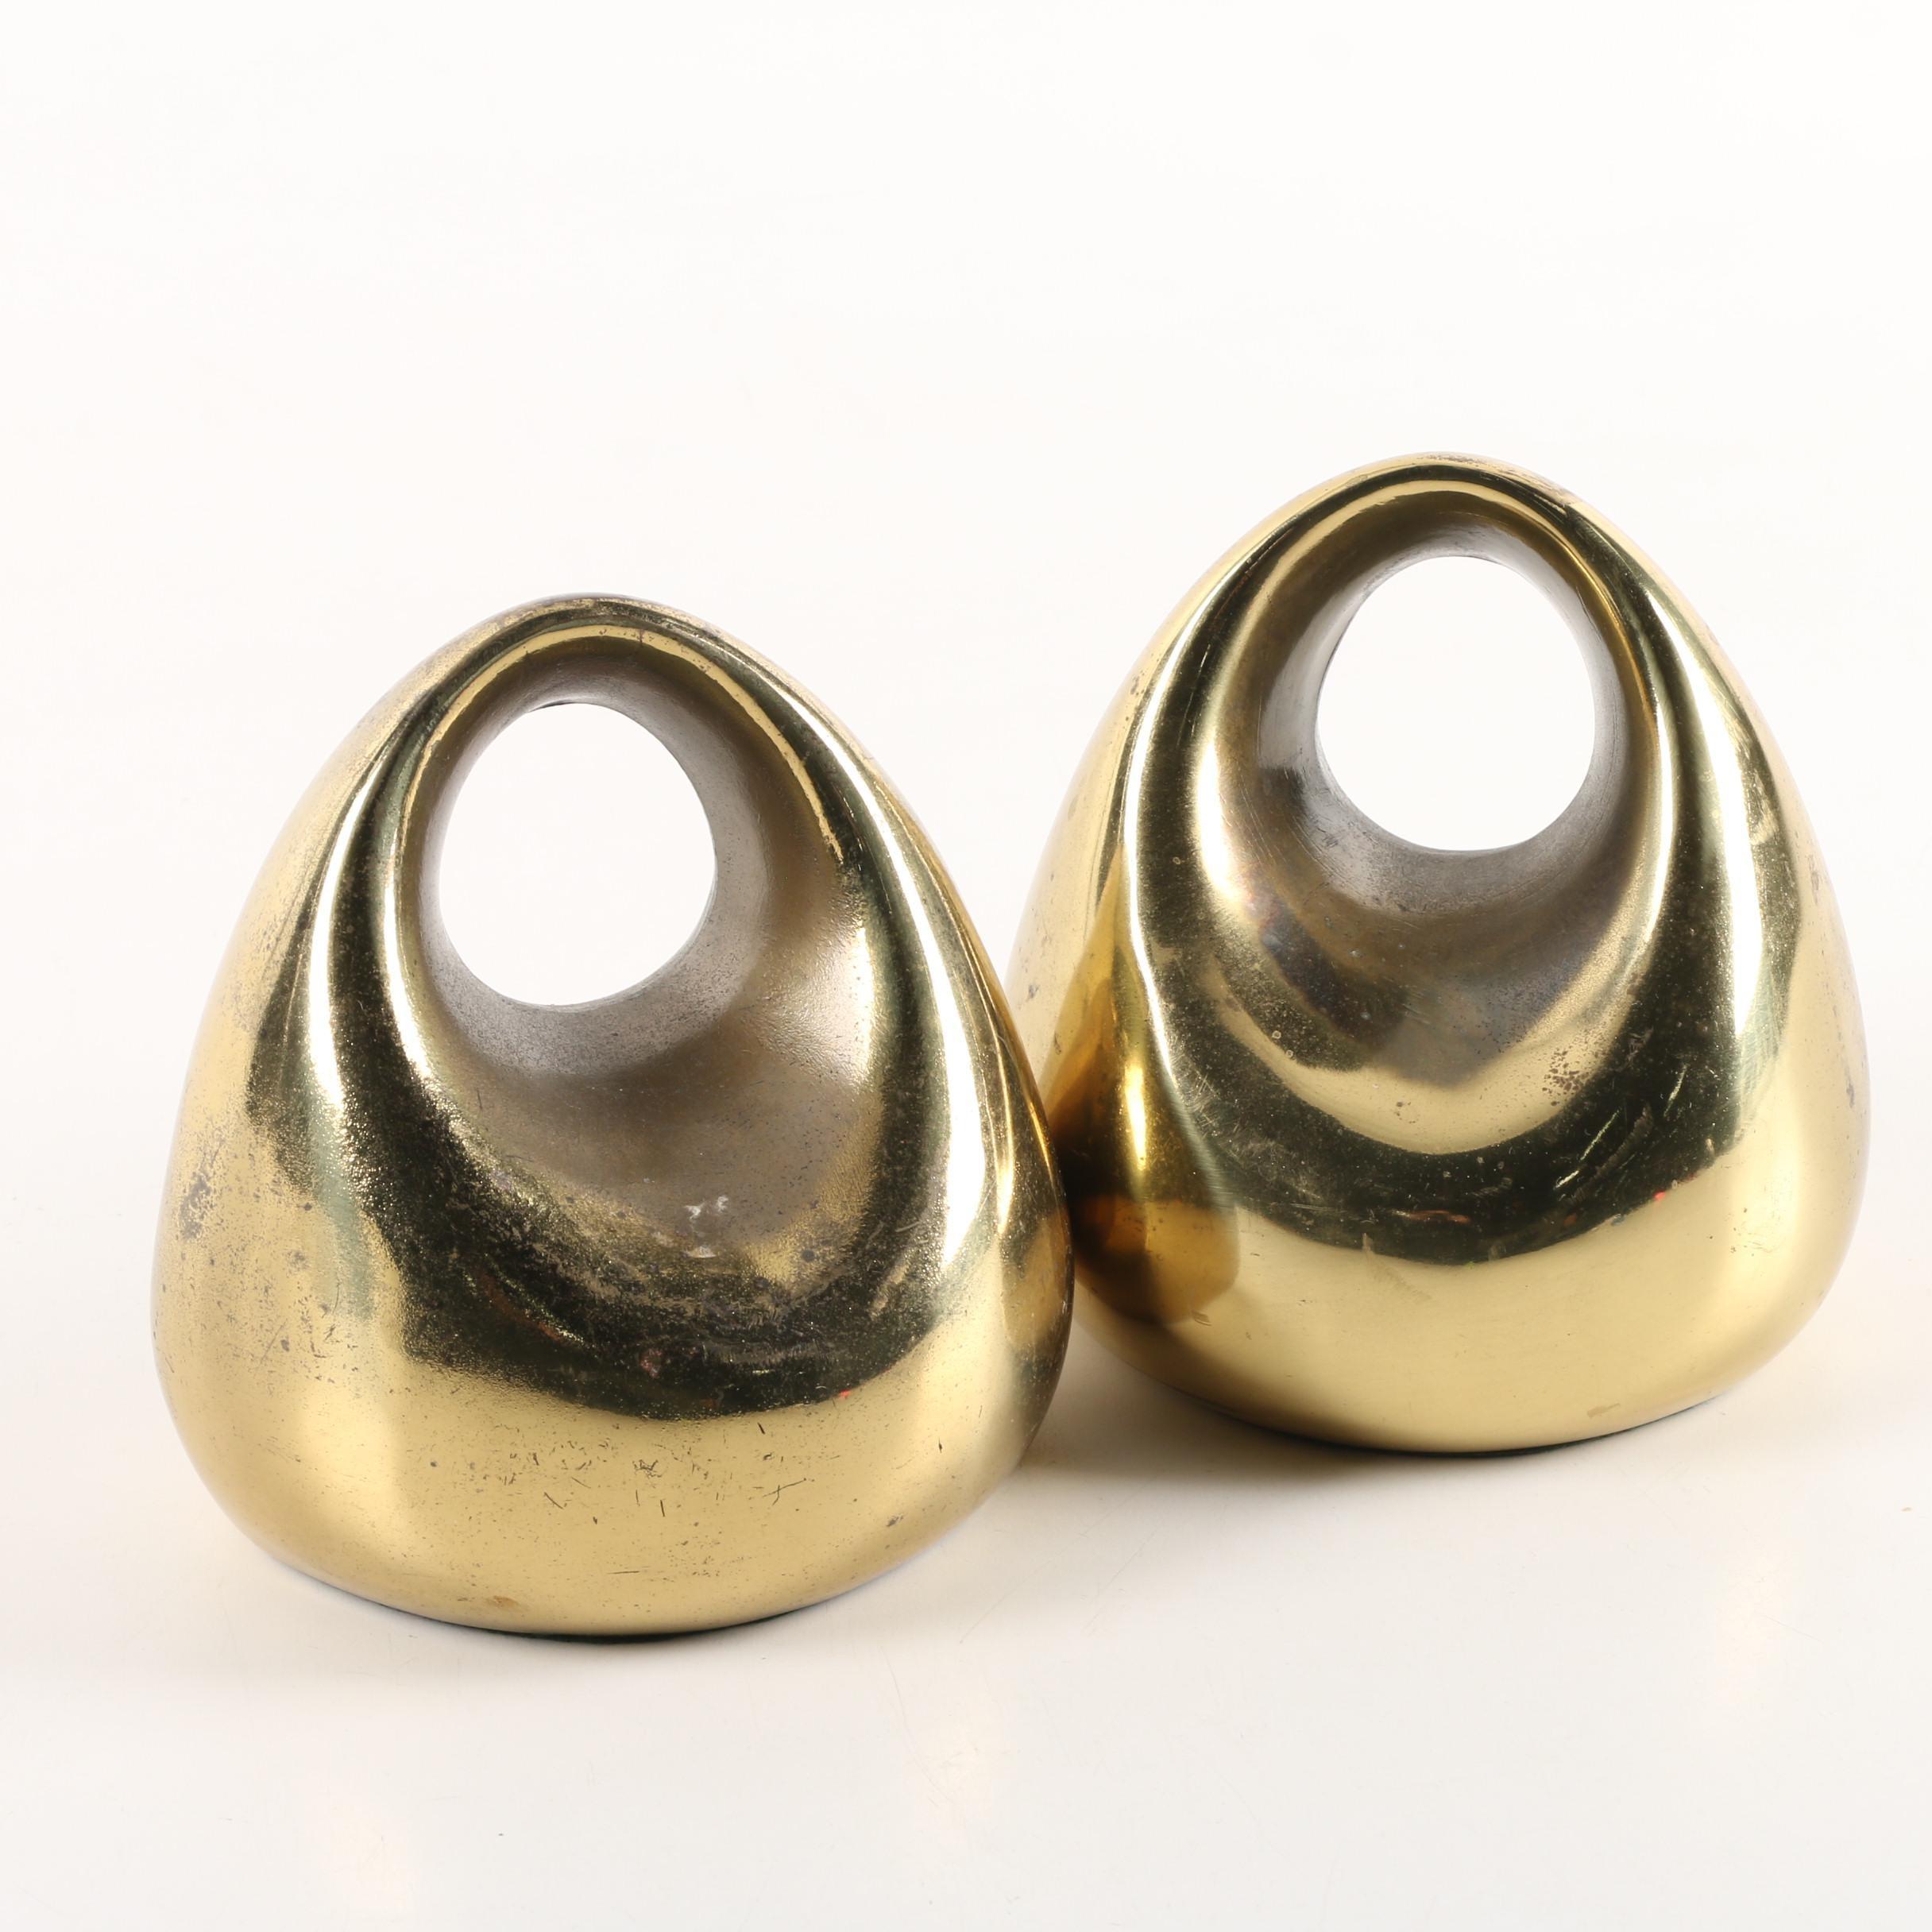 Ben Seibel Jenfred-Ware Mid-Century Brass Bookends